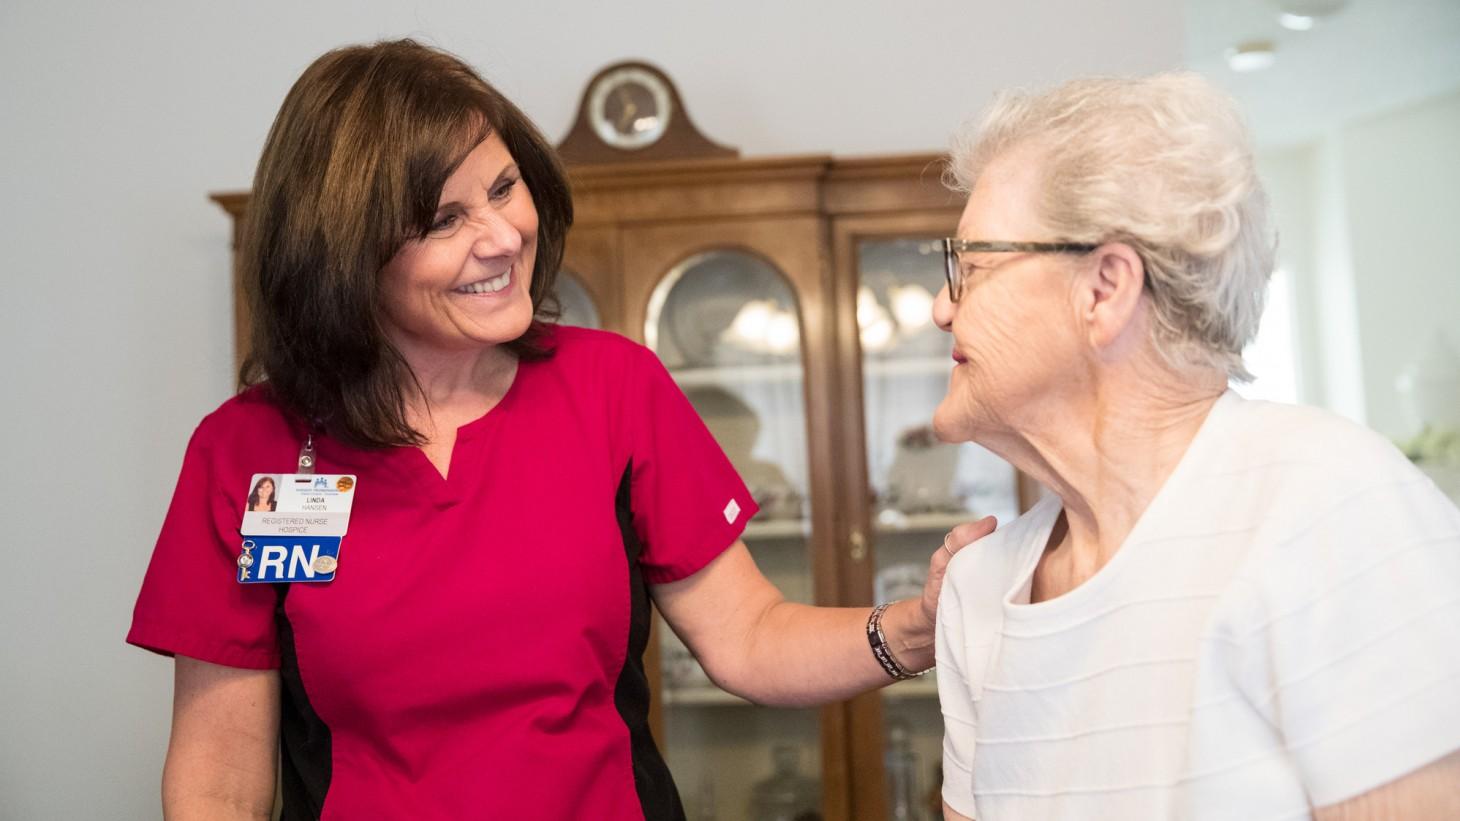 Linda Hansen, a nurse, standing with her patient, Madeline Lanell Haxton